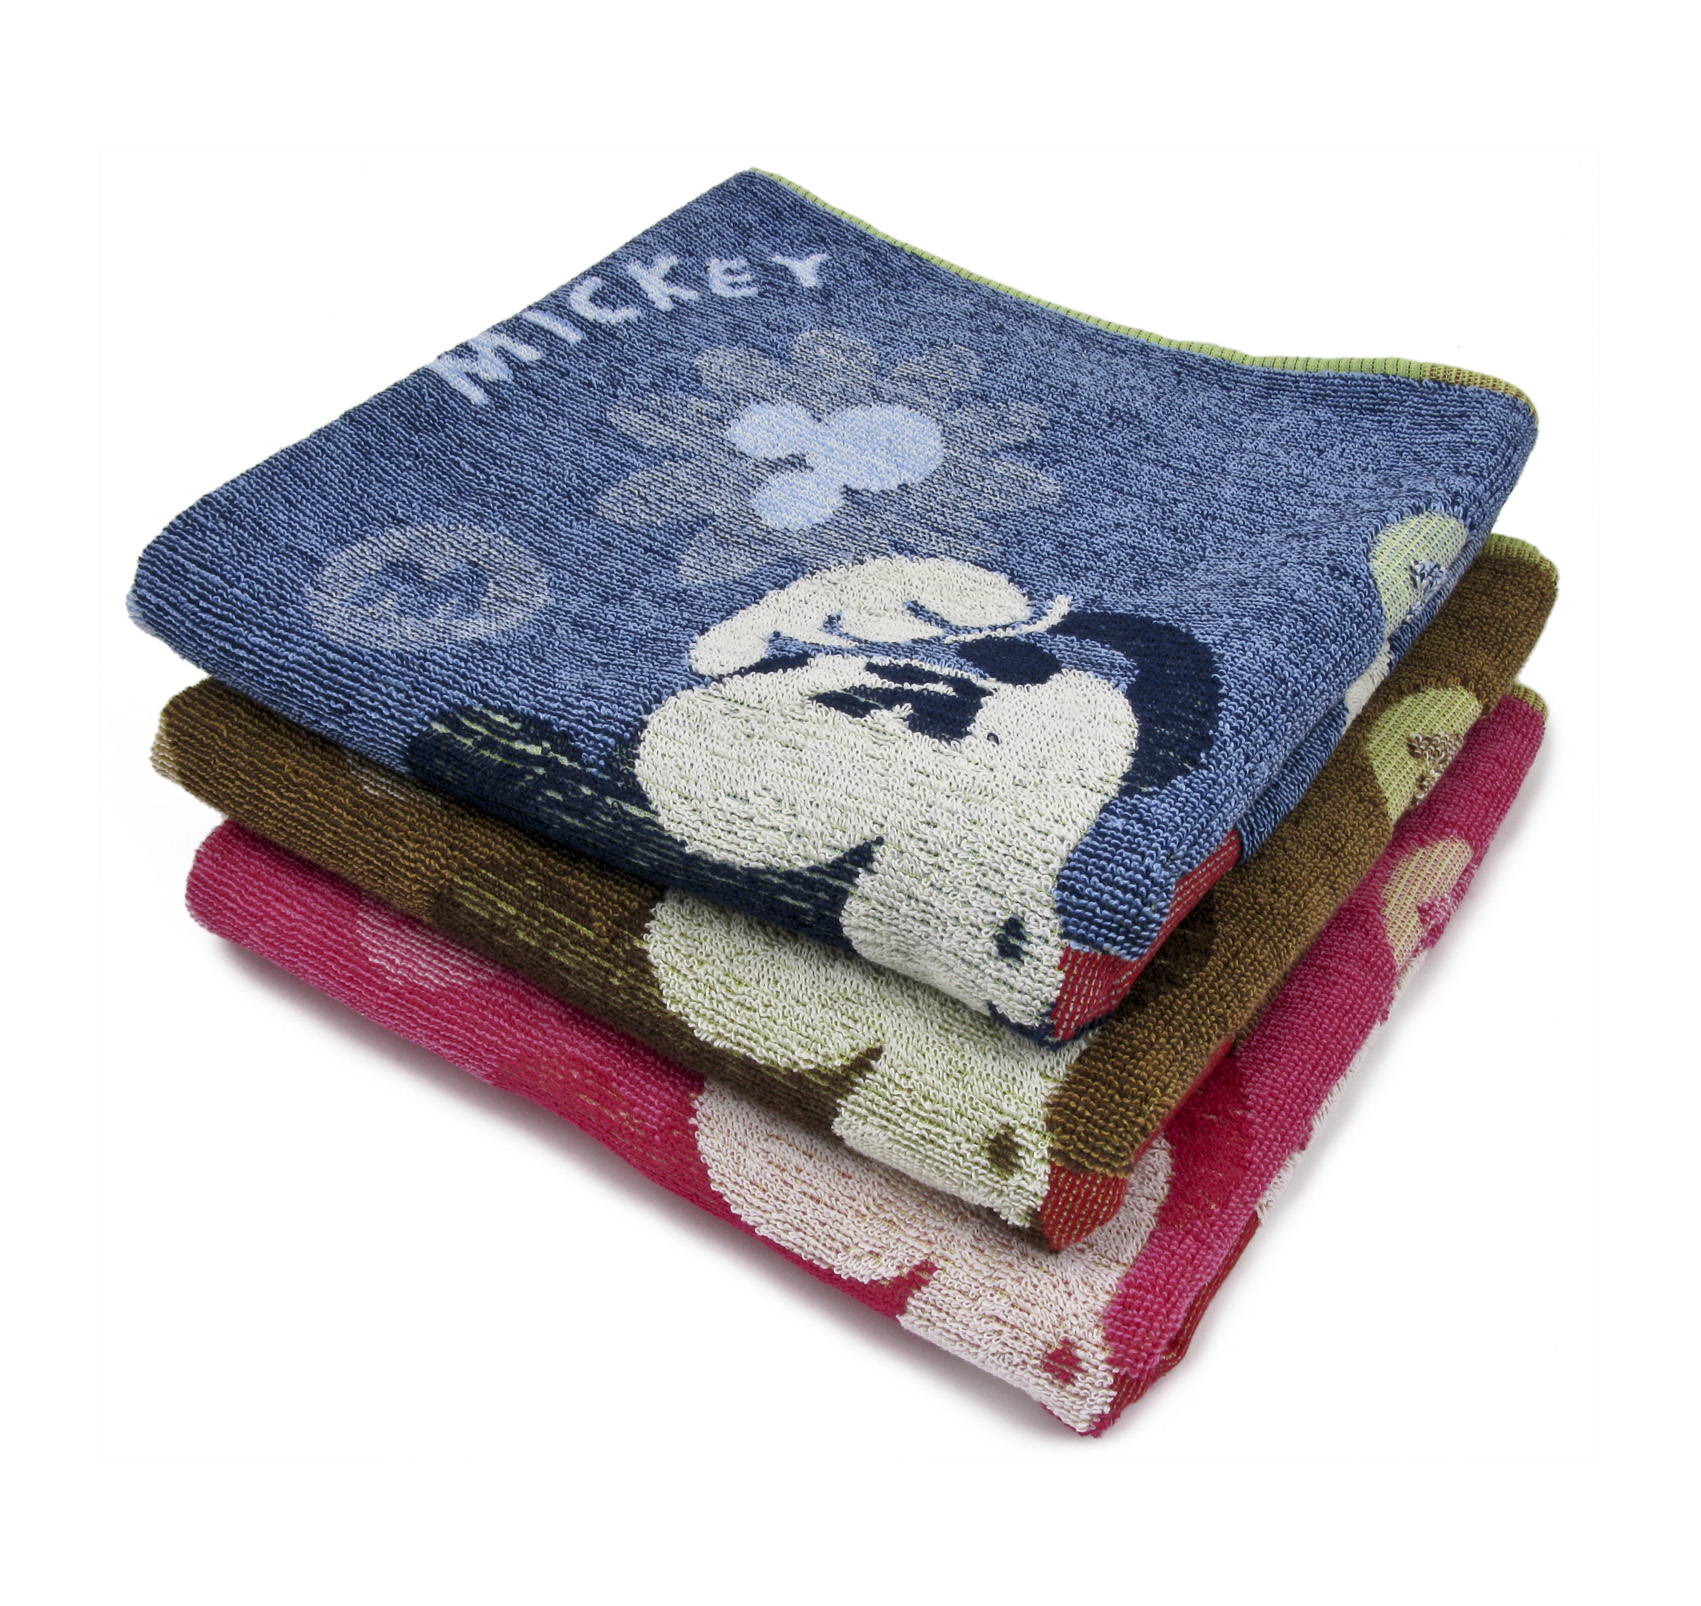 Полотенце Микки, цвет Коричневый, размер 65х135 смМахровые полотенца<br>Плотность ткани:370 г/кв. м.<br><br>Тип: Полотенце<br>Размер: 65х135<br>Материал: Махра